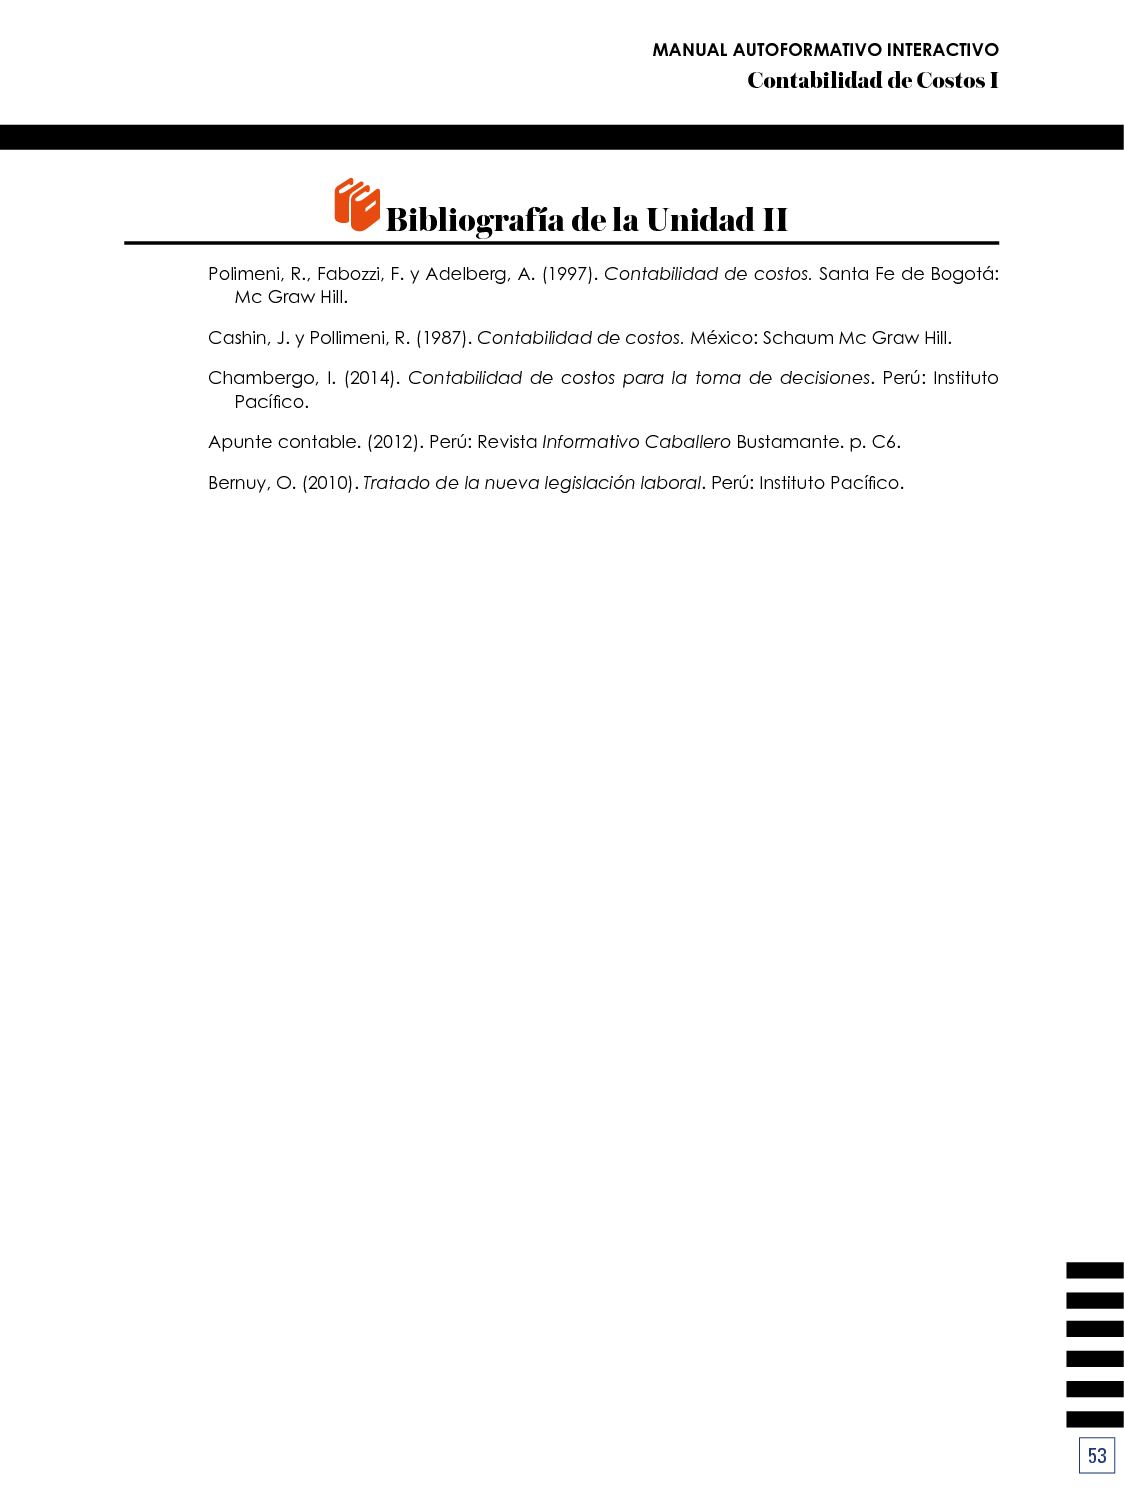 Contabilidad De Costos I Uc0131 Calameo Downloader